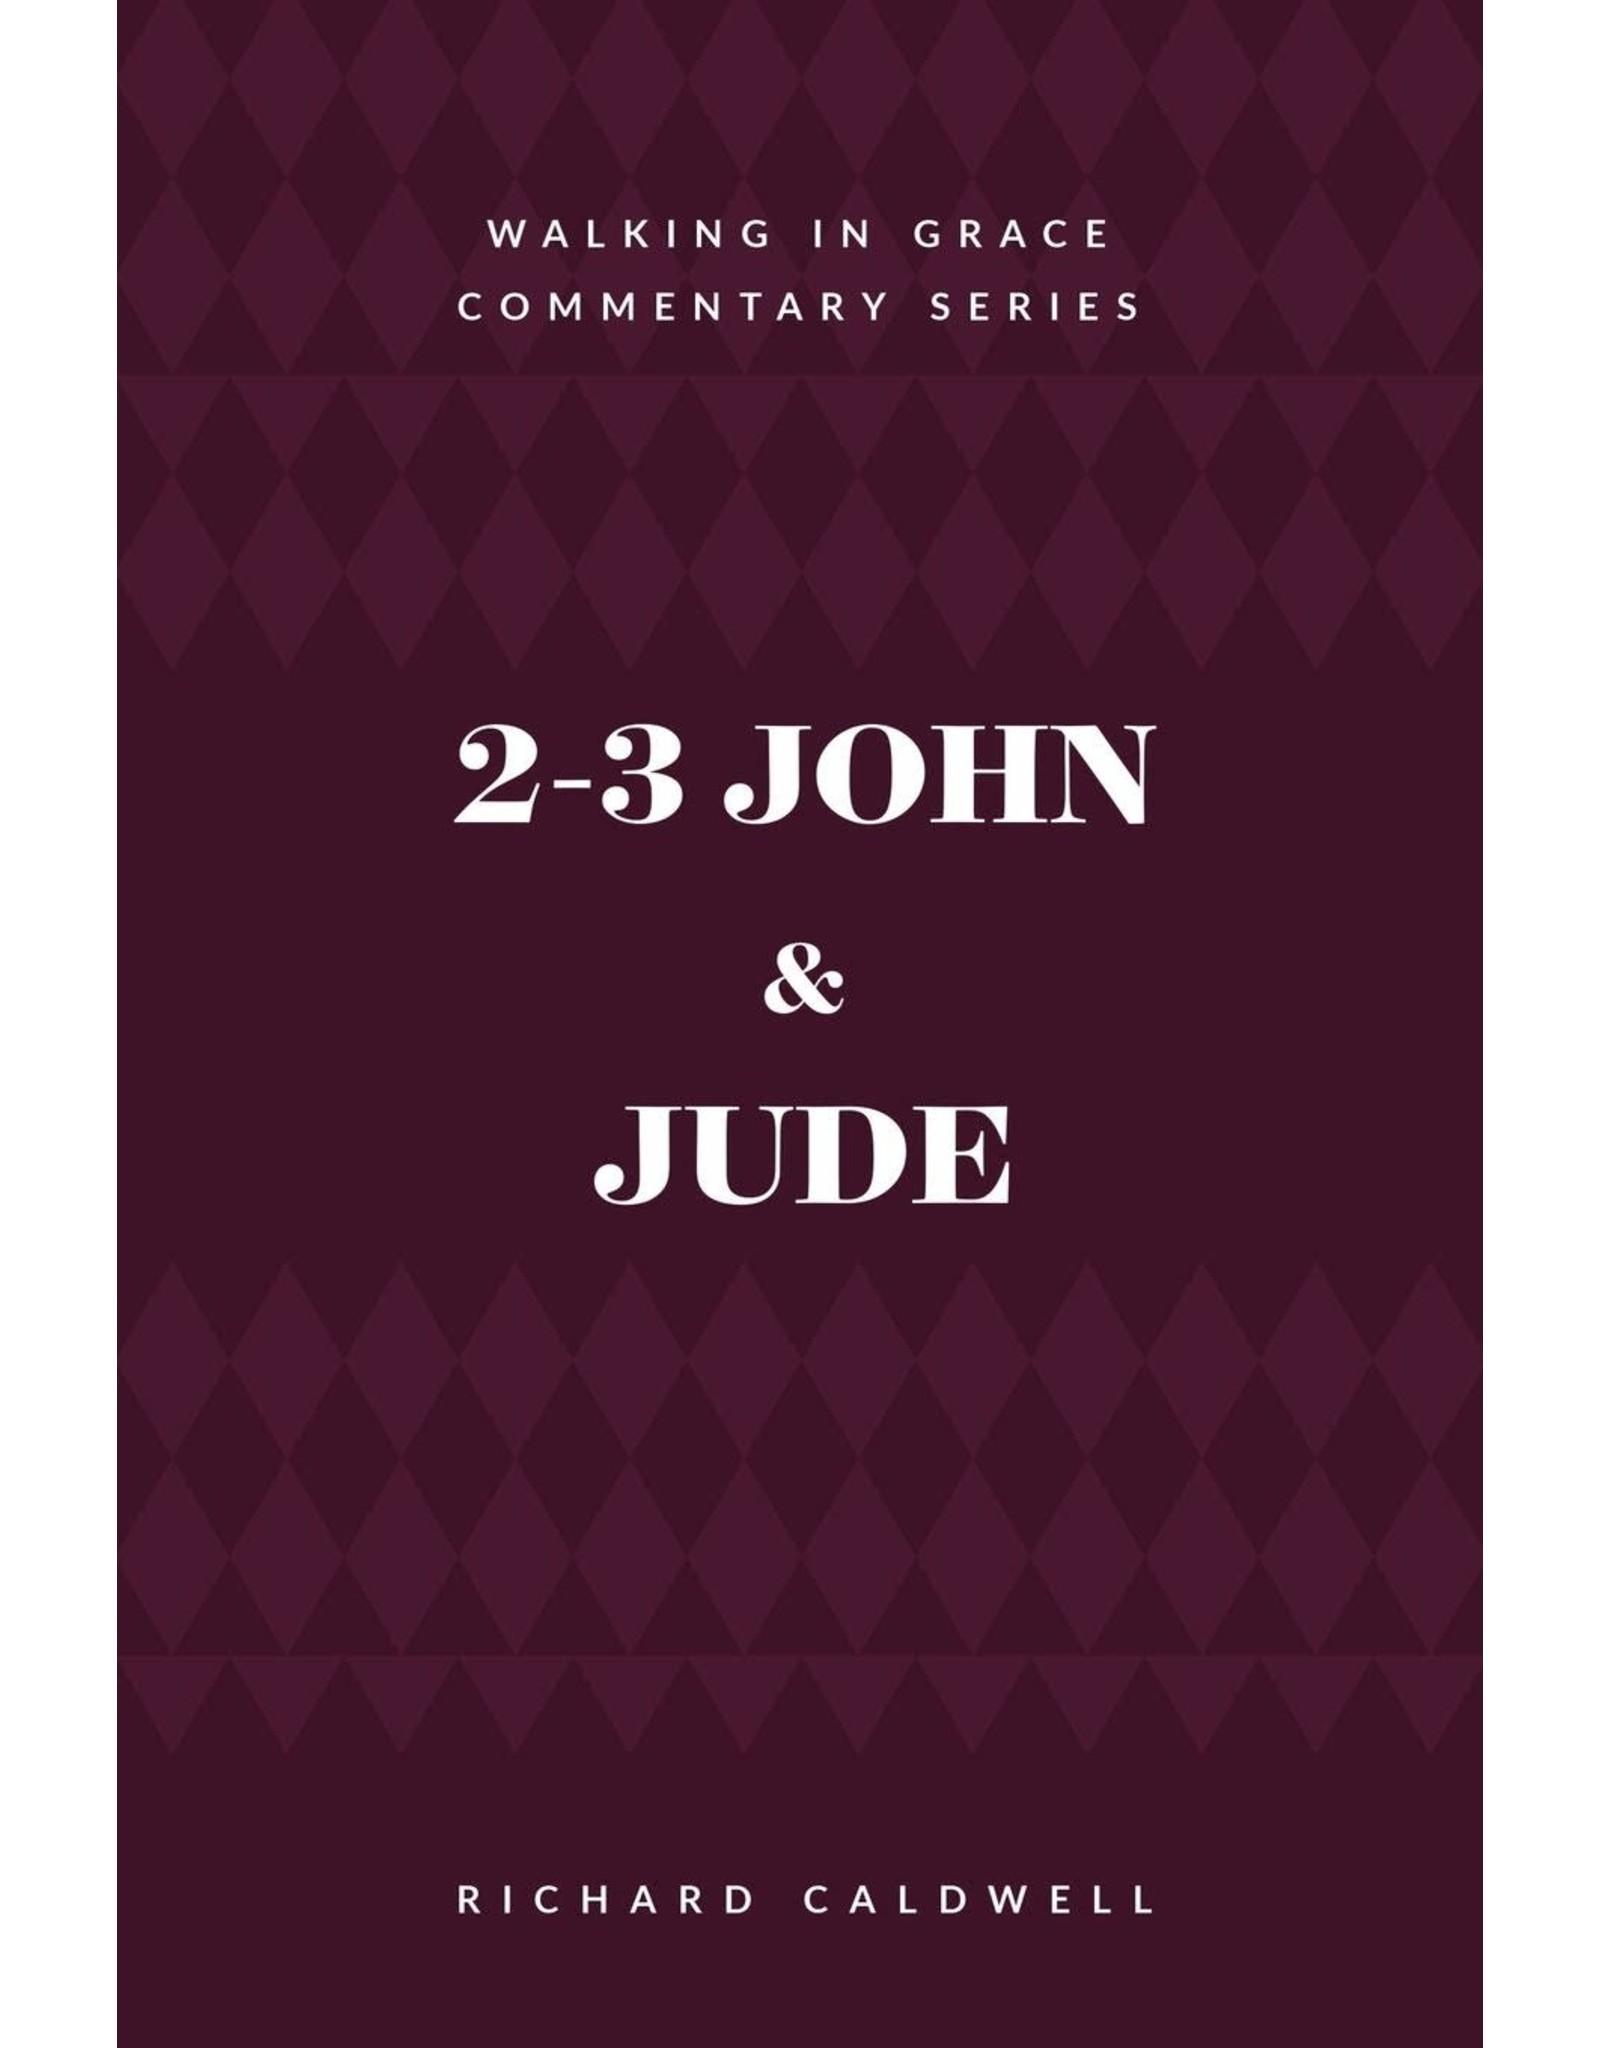 Kress 2-3 John & Jude: Truth and Danger in the Church (WGCS)